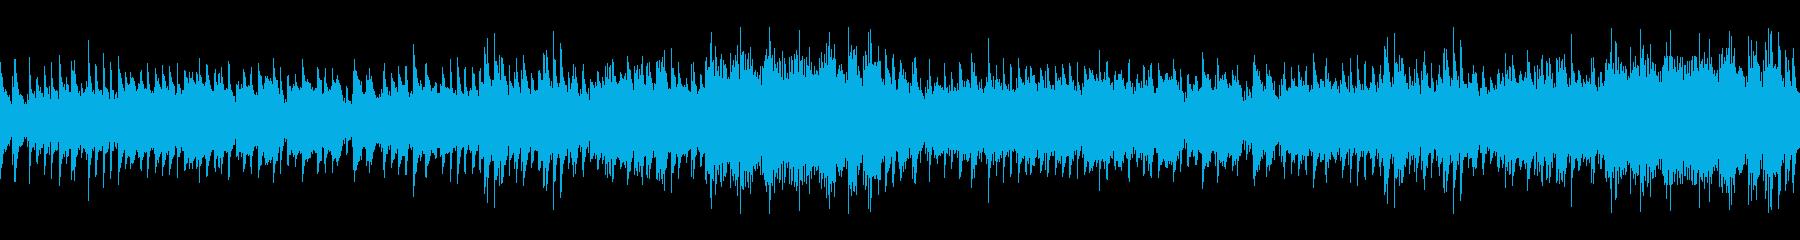 RPGのフィールドっぽい曲(夜版) の再生済みの波形